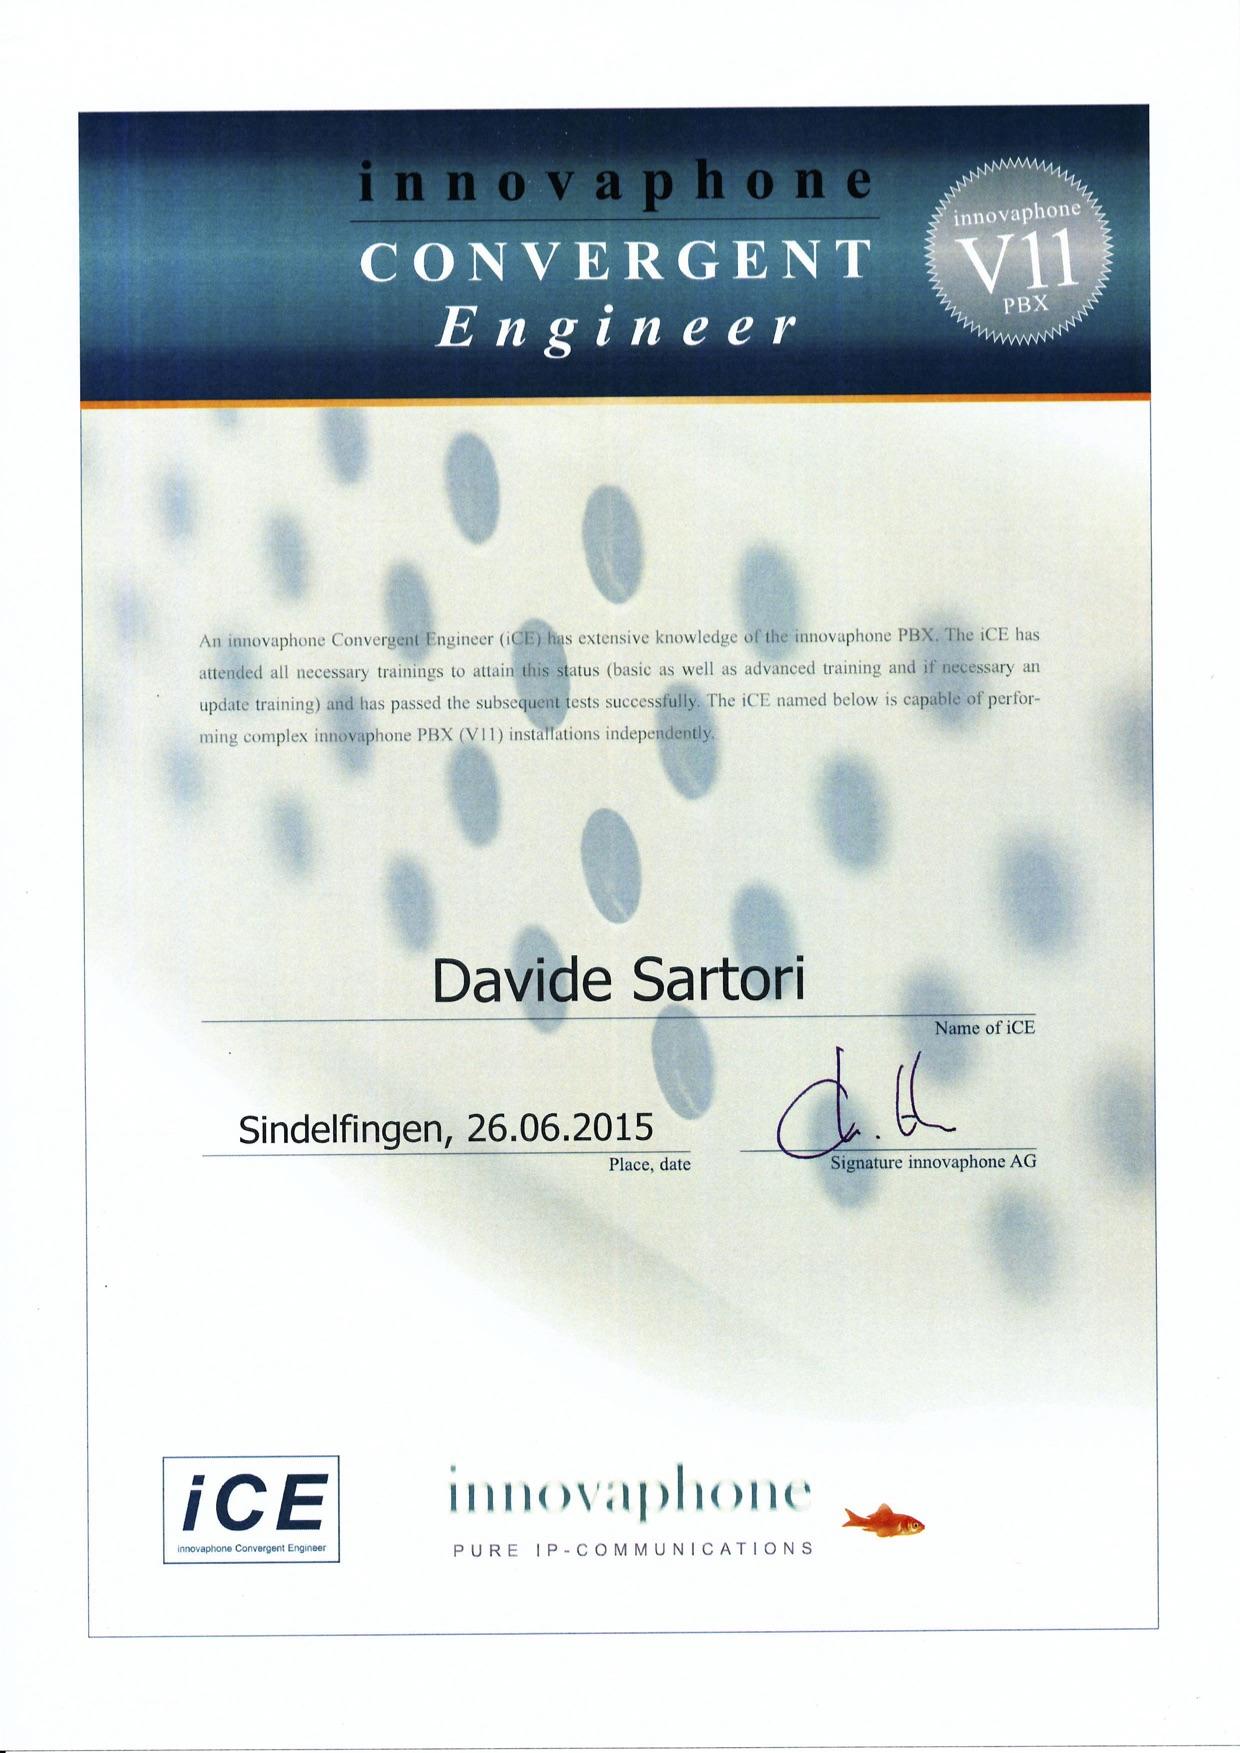 Innovaphone Convergent Engineer